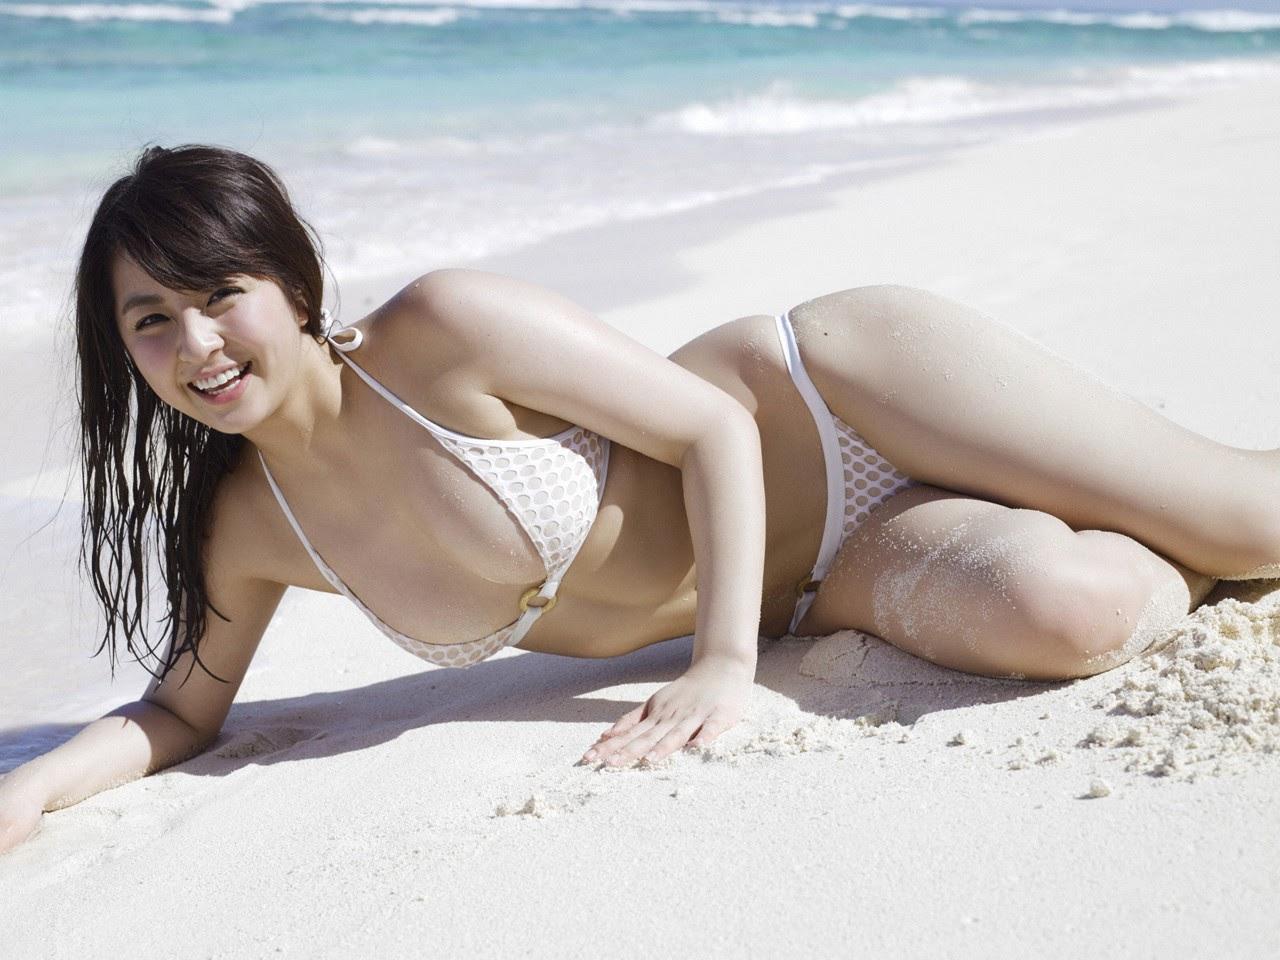 Bikini on a white sandy beach044